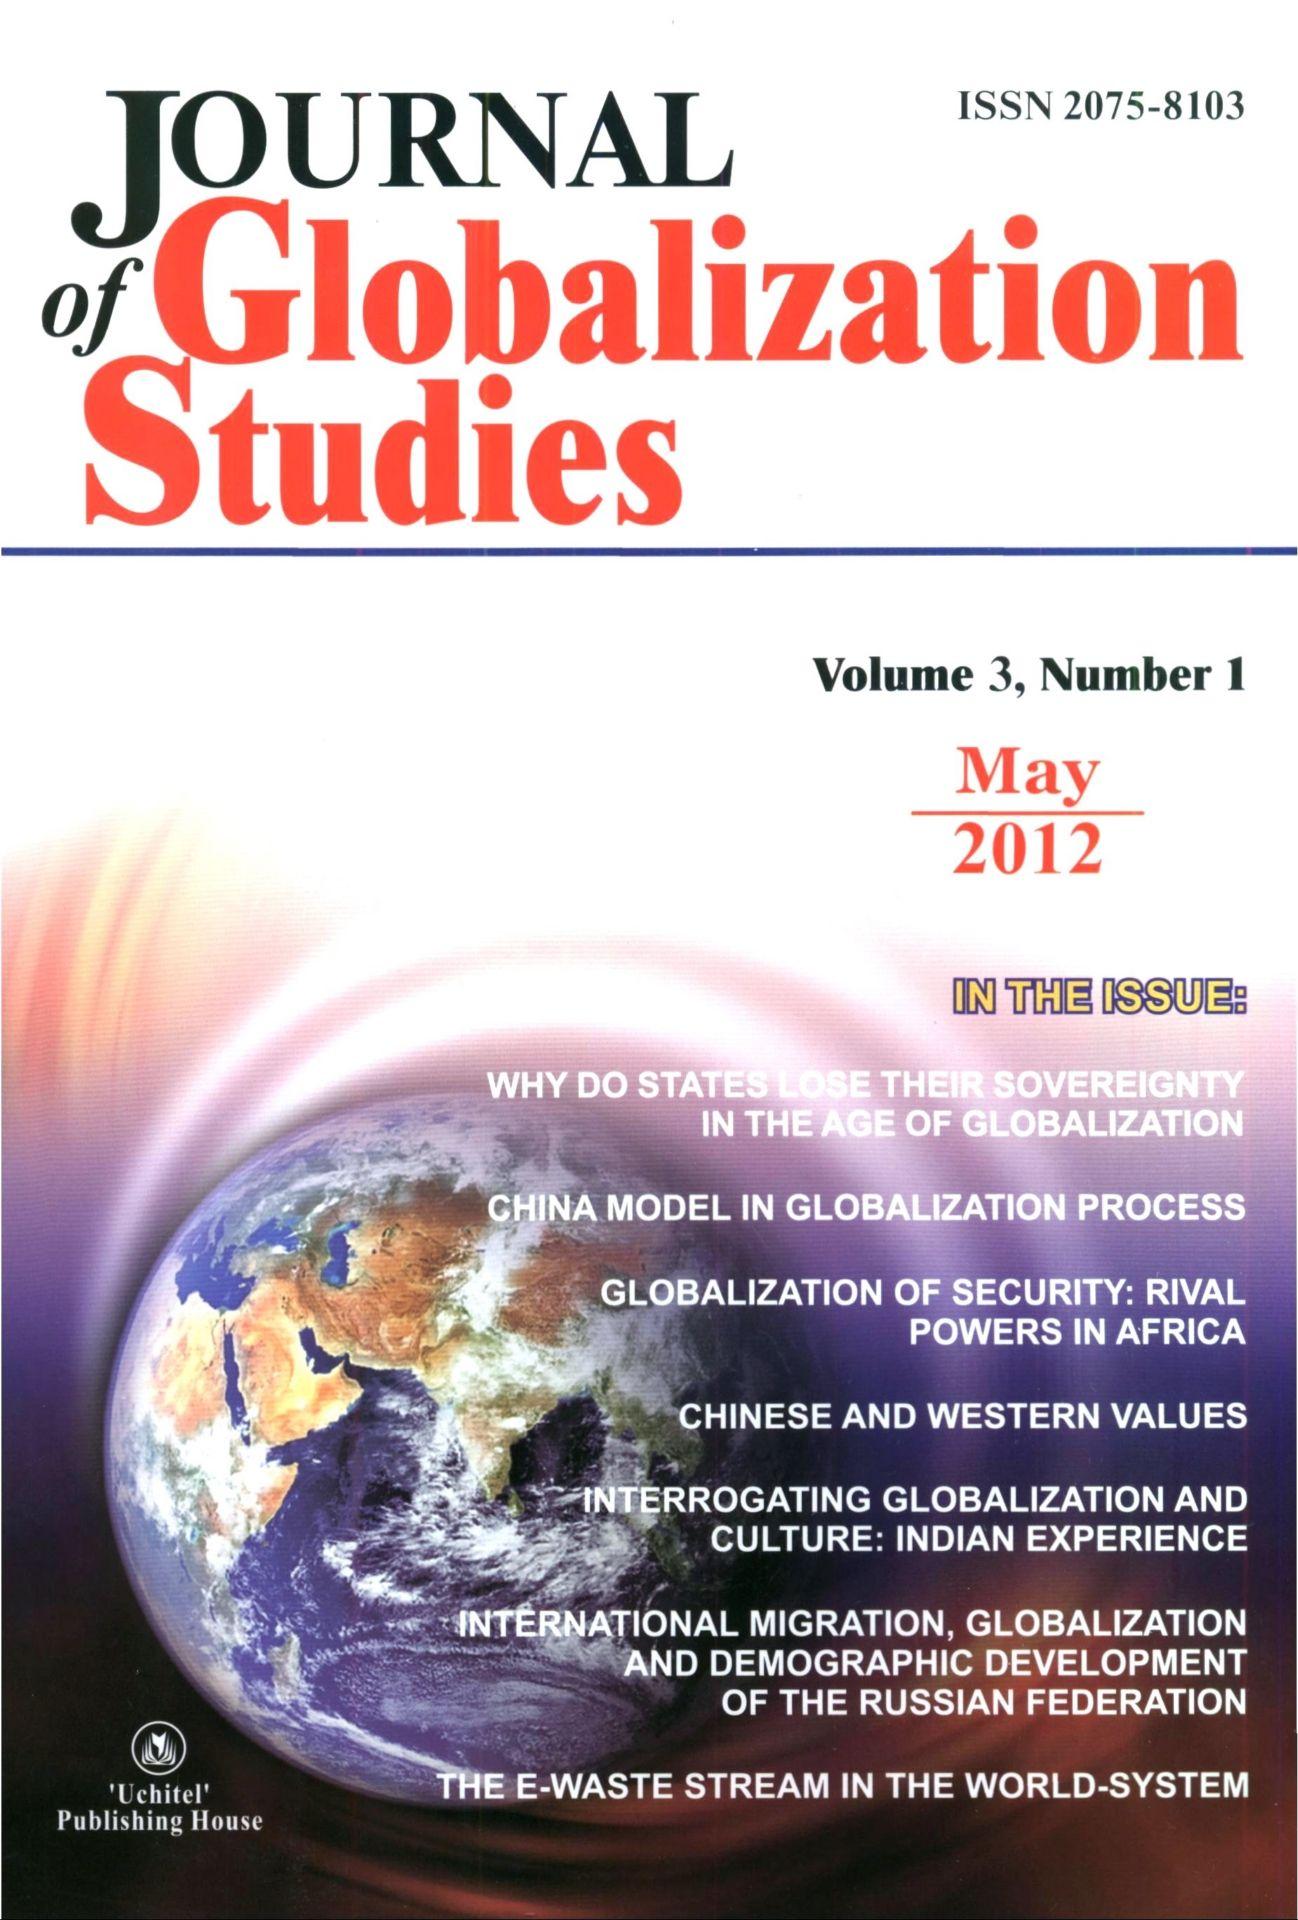 Journal of Globalization Studies Volume 3, Number 1, 2012 г. Журнал глобализационных исследований Международный журнал на английском языке.